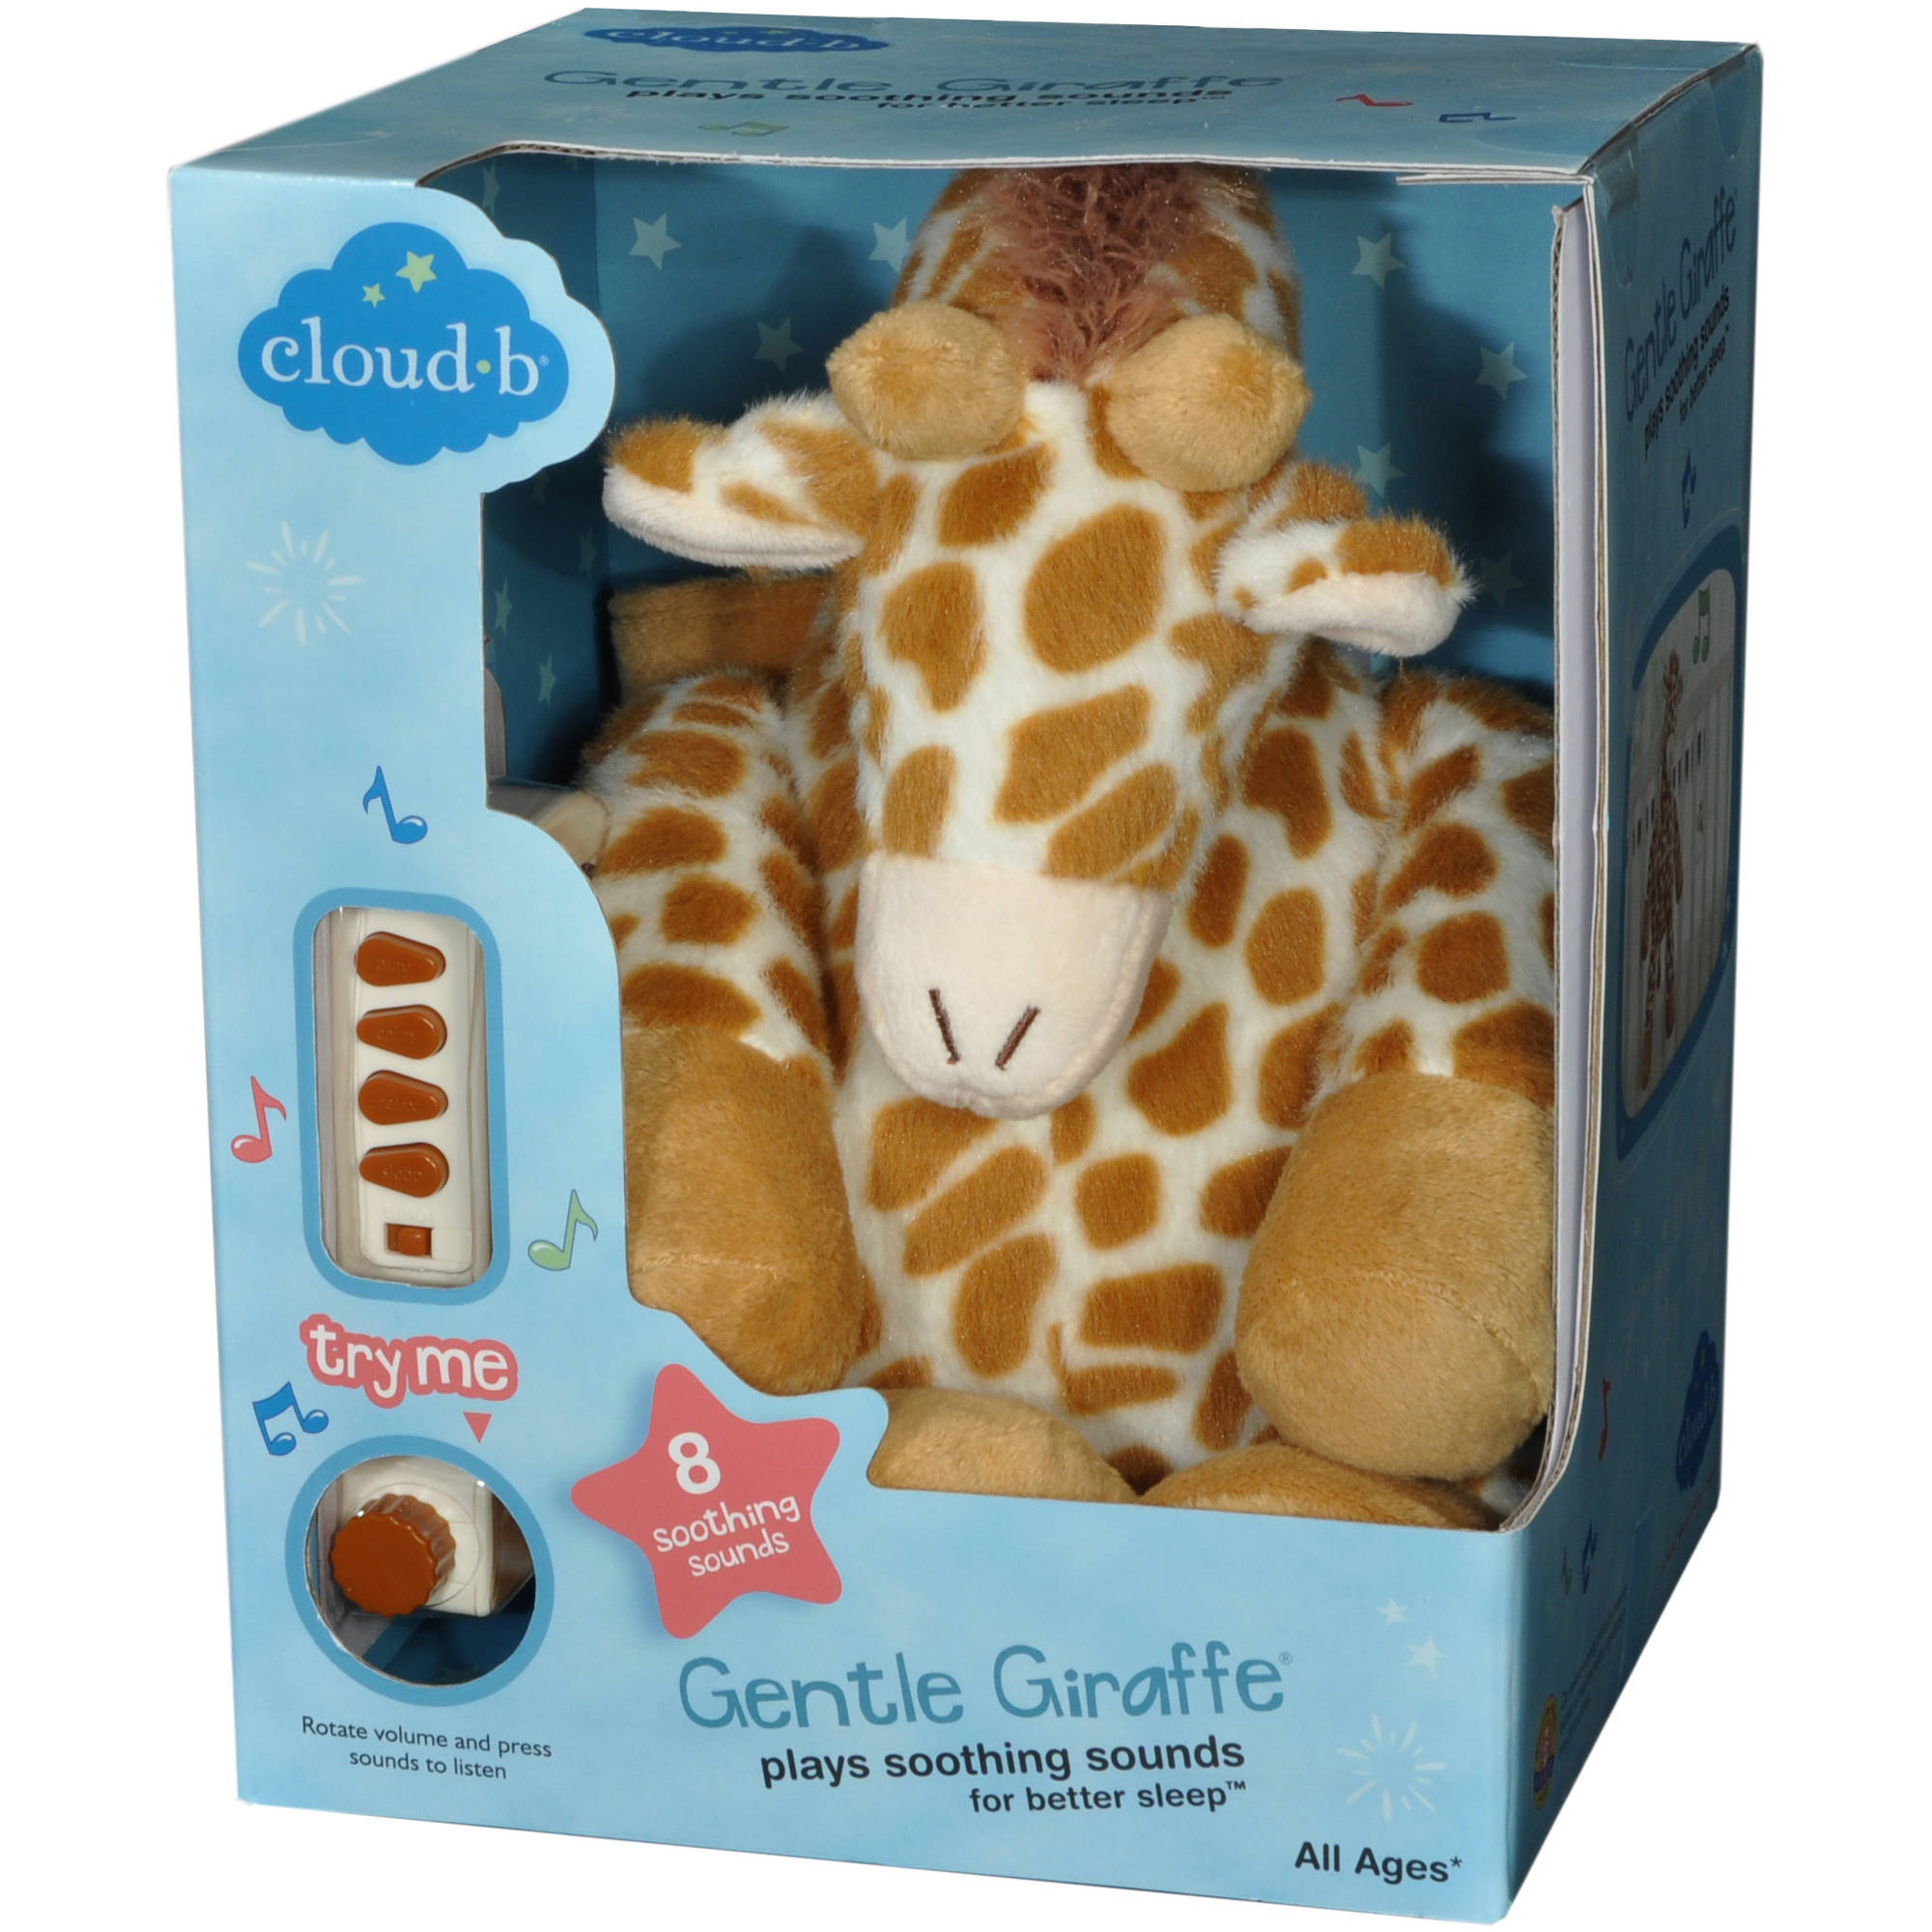 Cloud B Gentle Giraffe Multi-Colored - Walmart.com